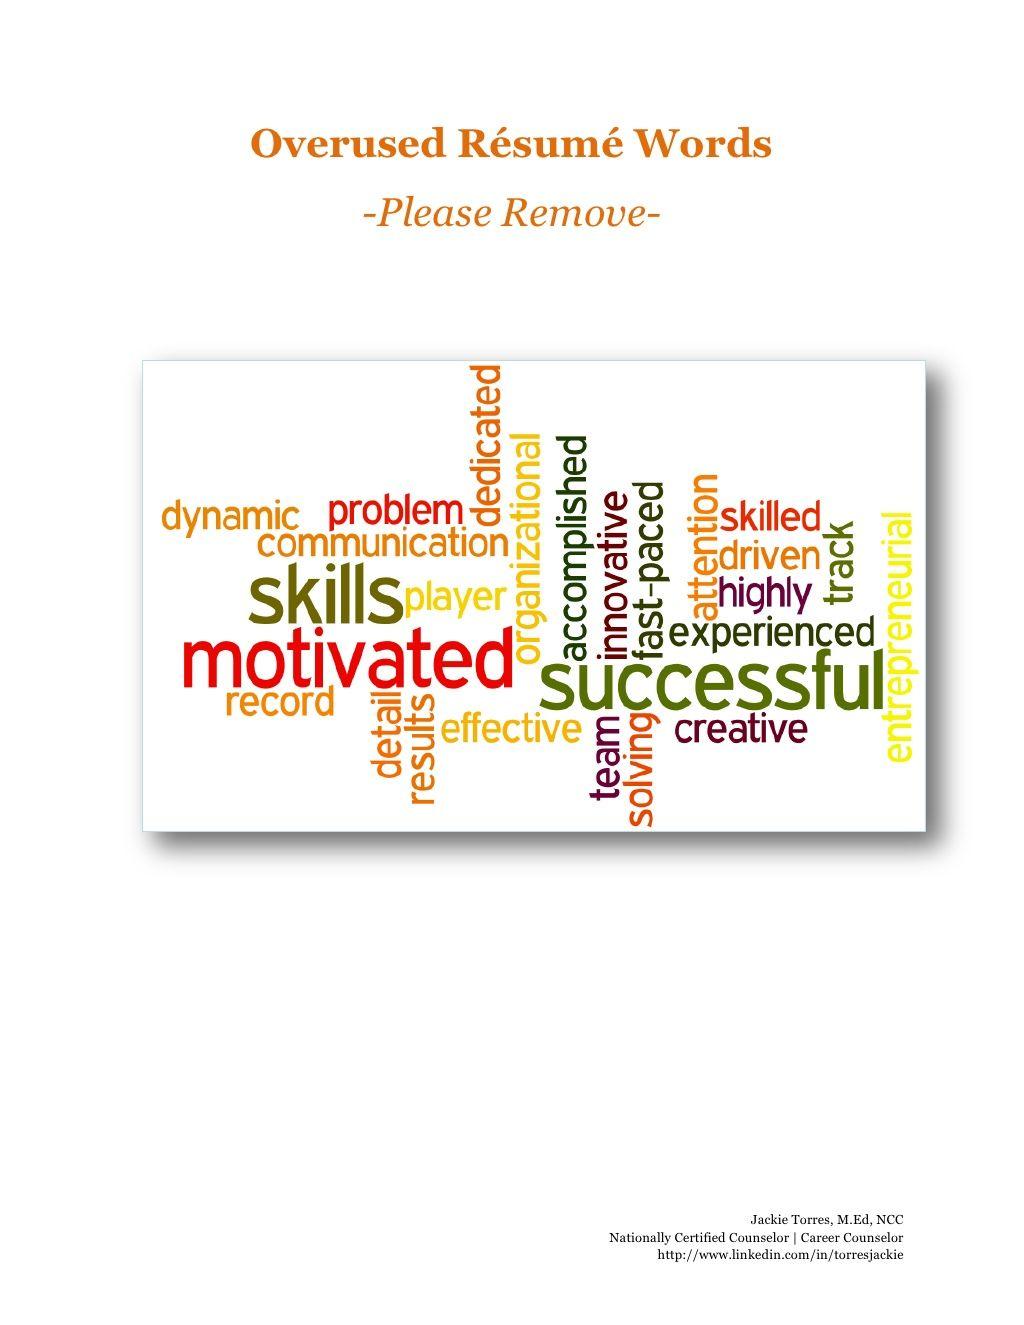 Overused Resume Words Take Em Out Via Slideshare Words